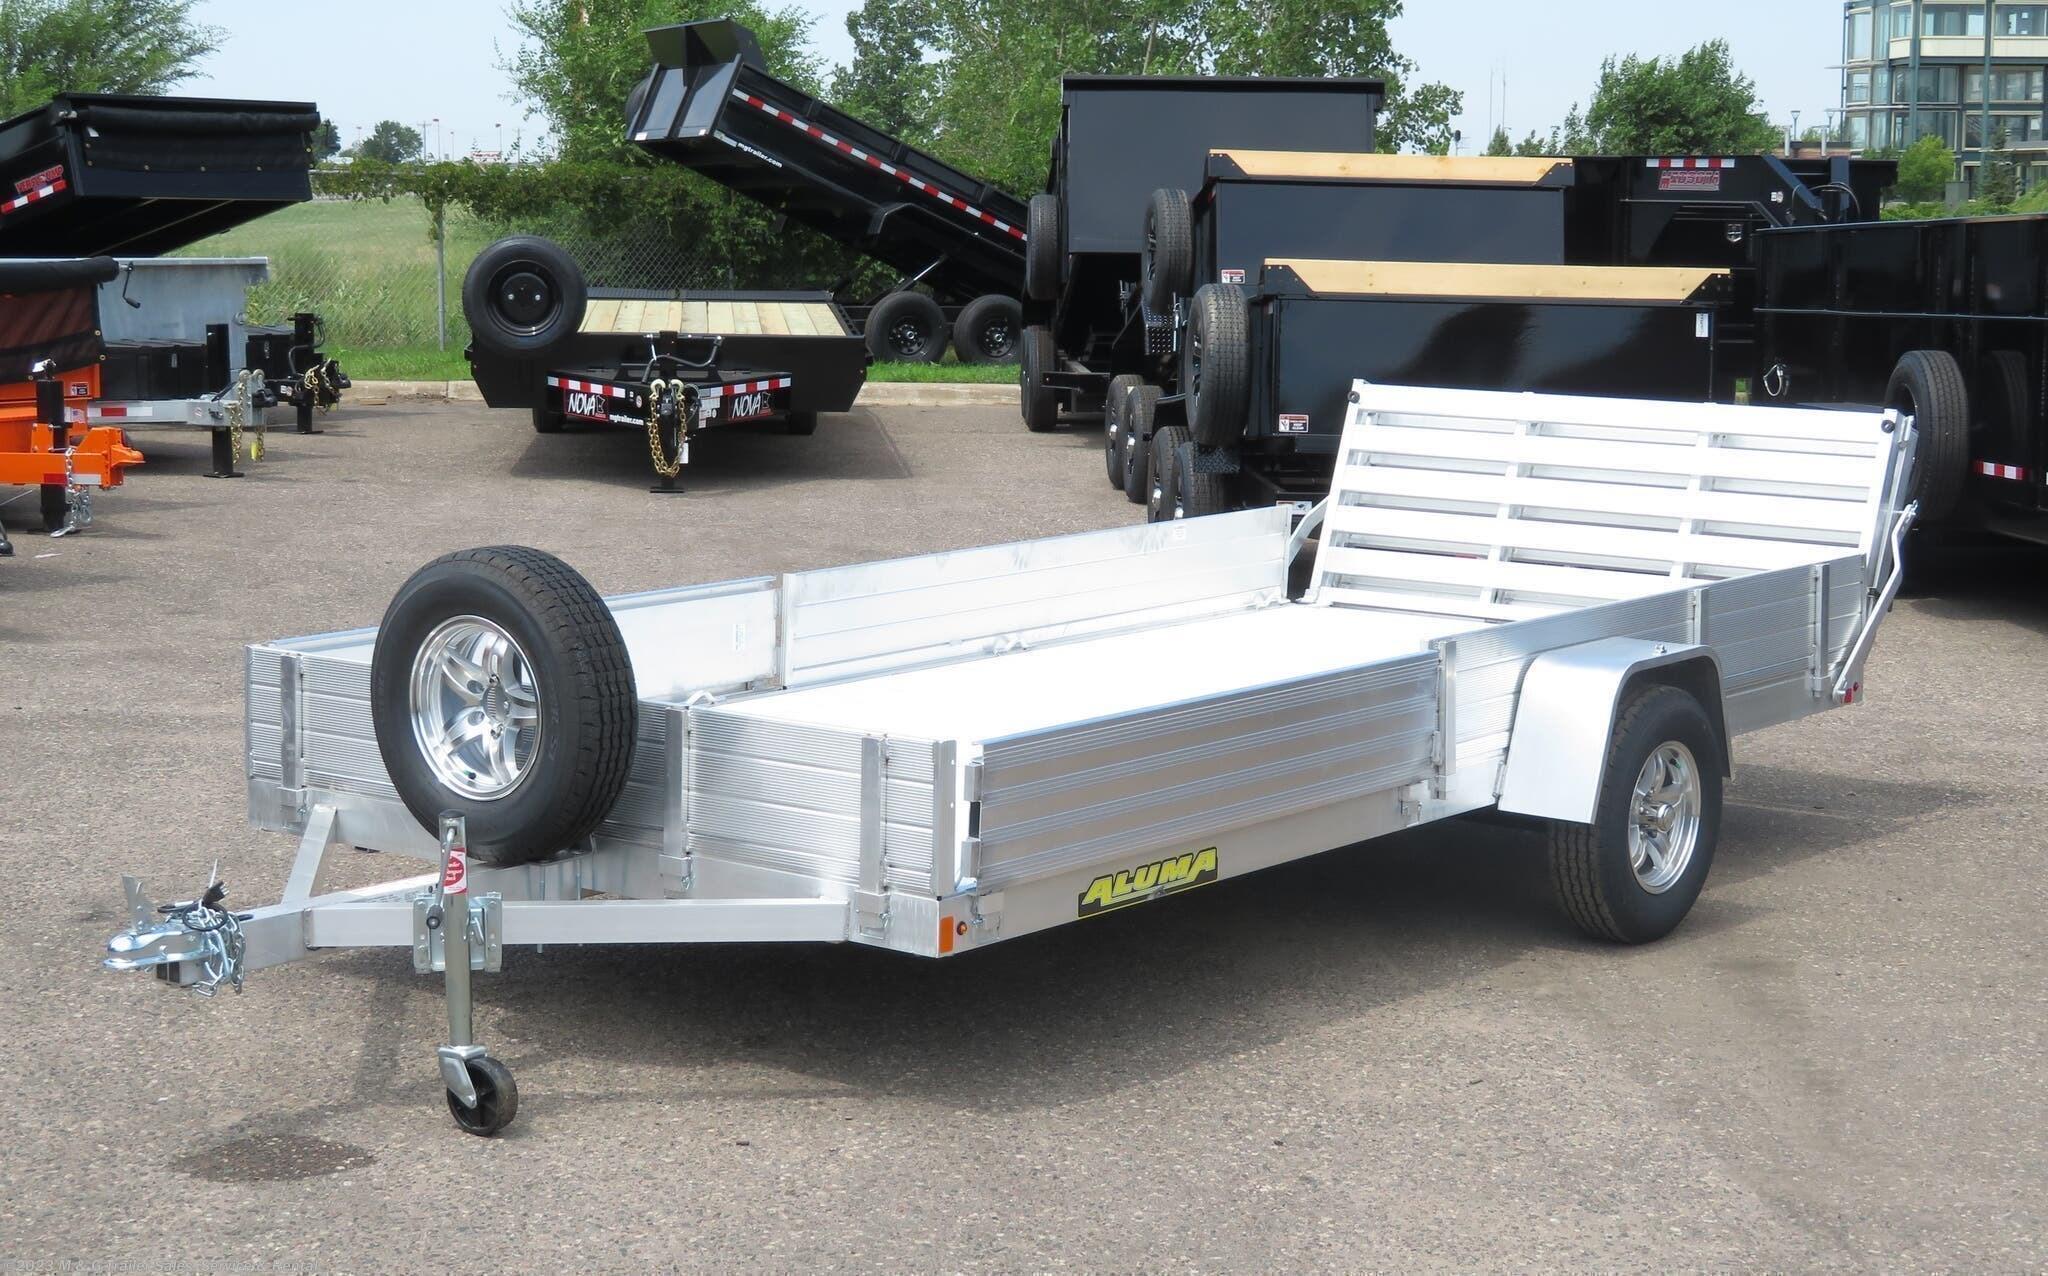 2021 Aluma 8114 SR Aluminum ATV/Utility Trailer - Stock #227082